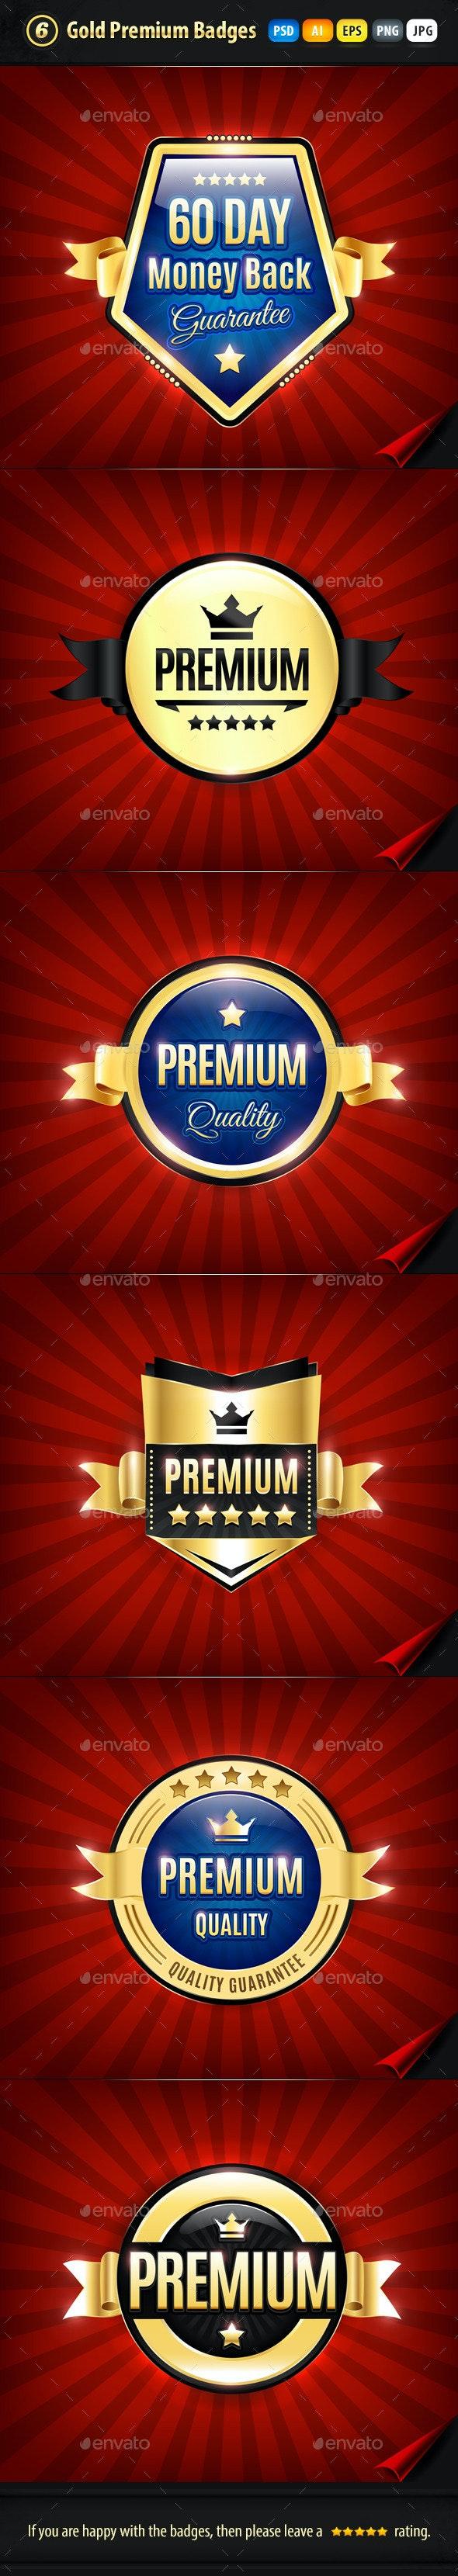 6 Gold Premium Quality Badges - Badges & Stickers Web Elements